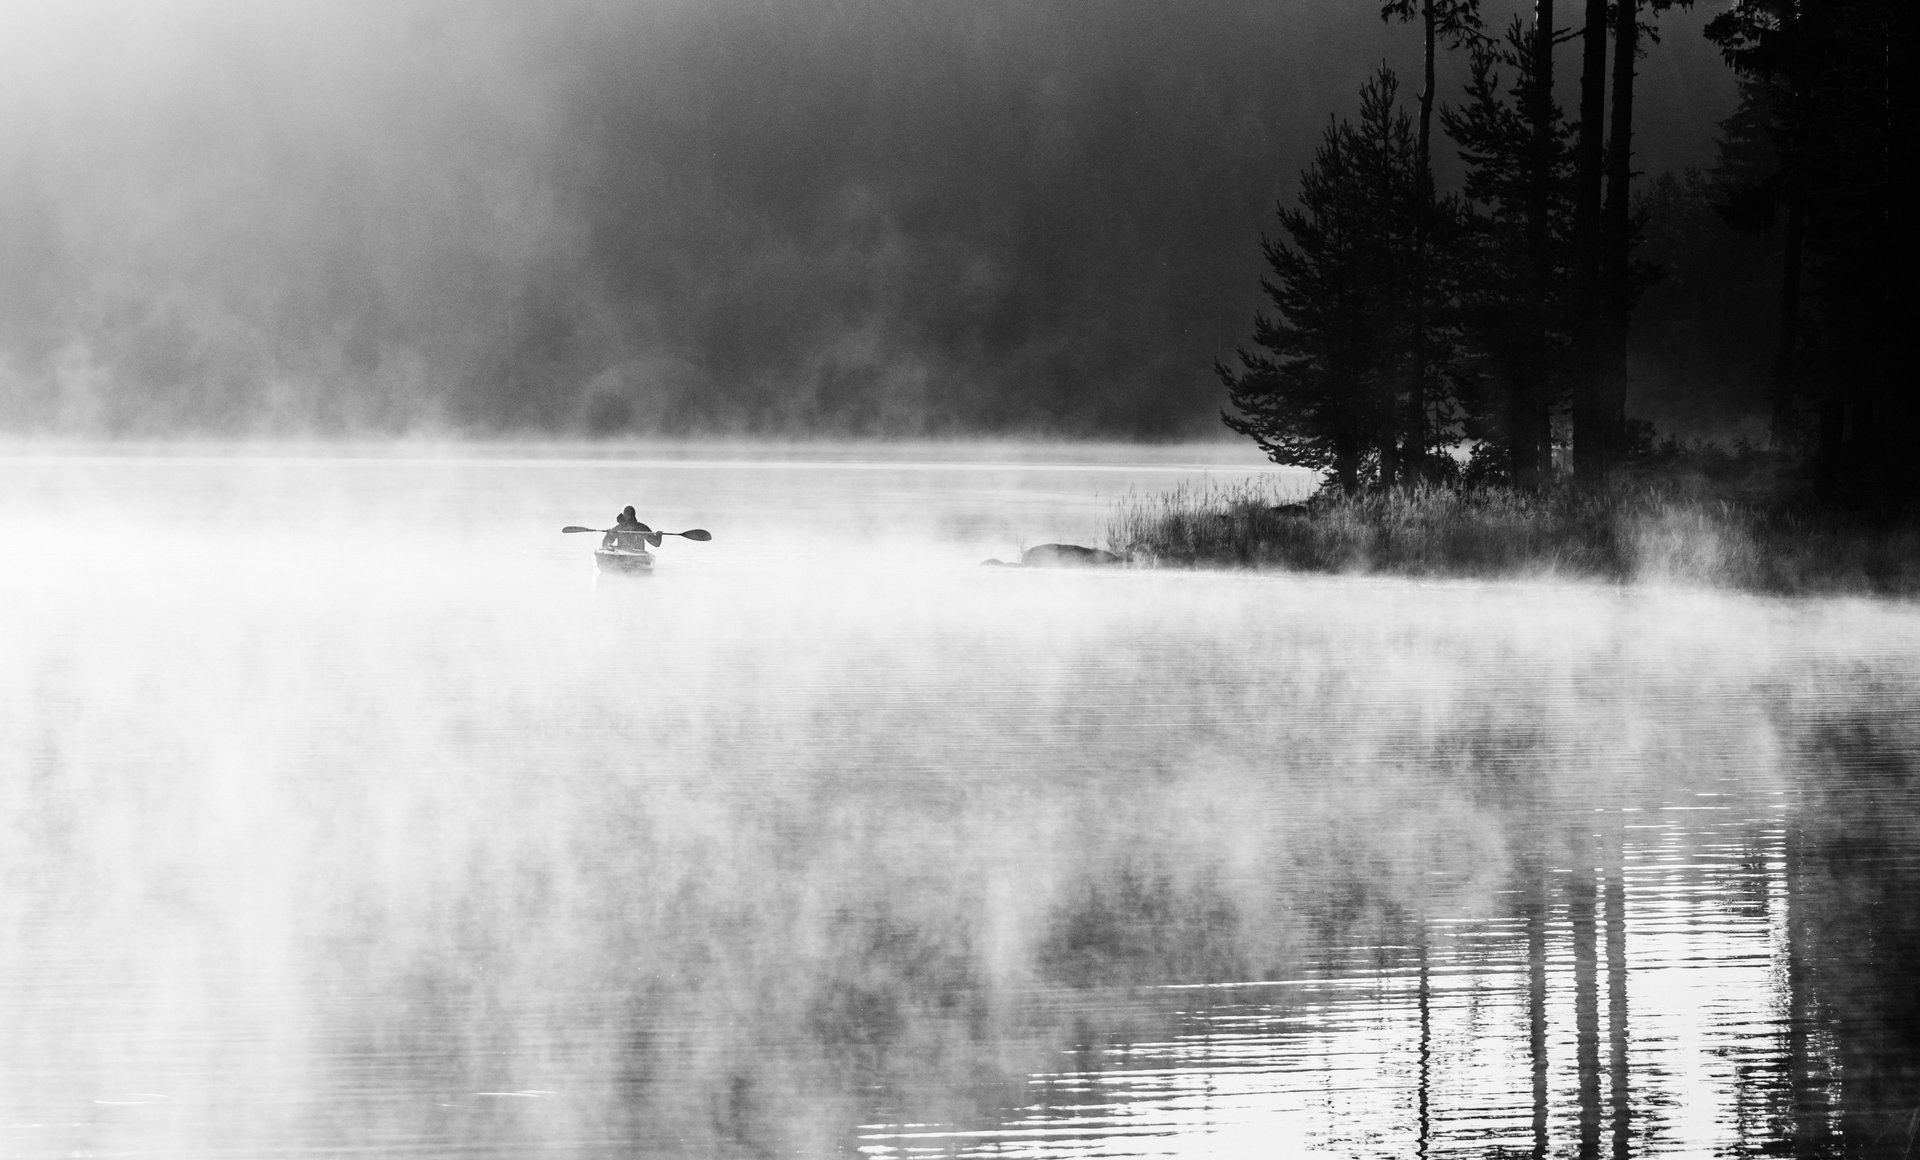 Photo in Everything else | Author Nadezhda Raycheva - sunnyhope | PHOTO FORUM